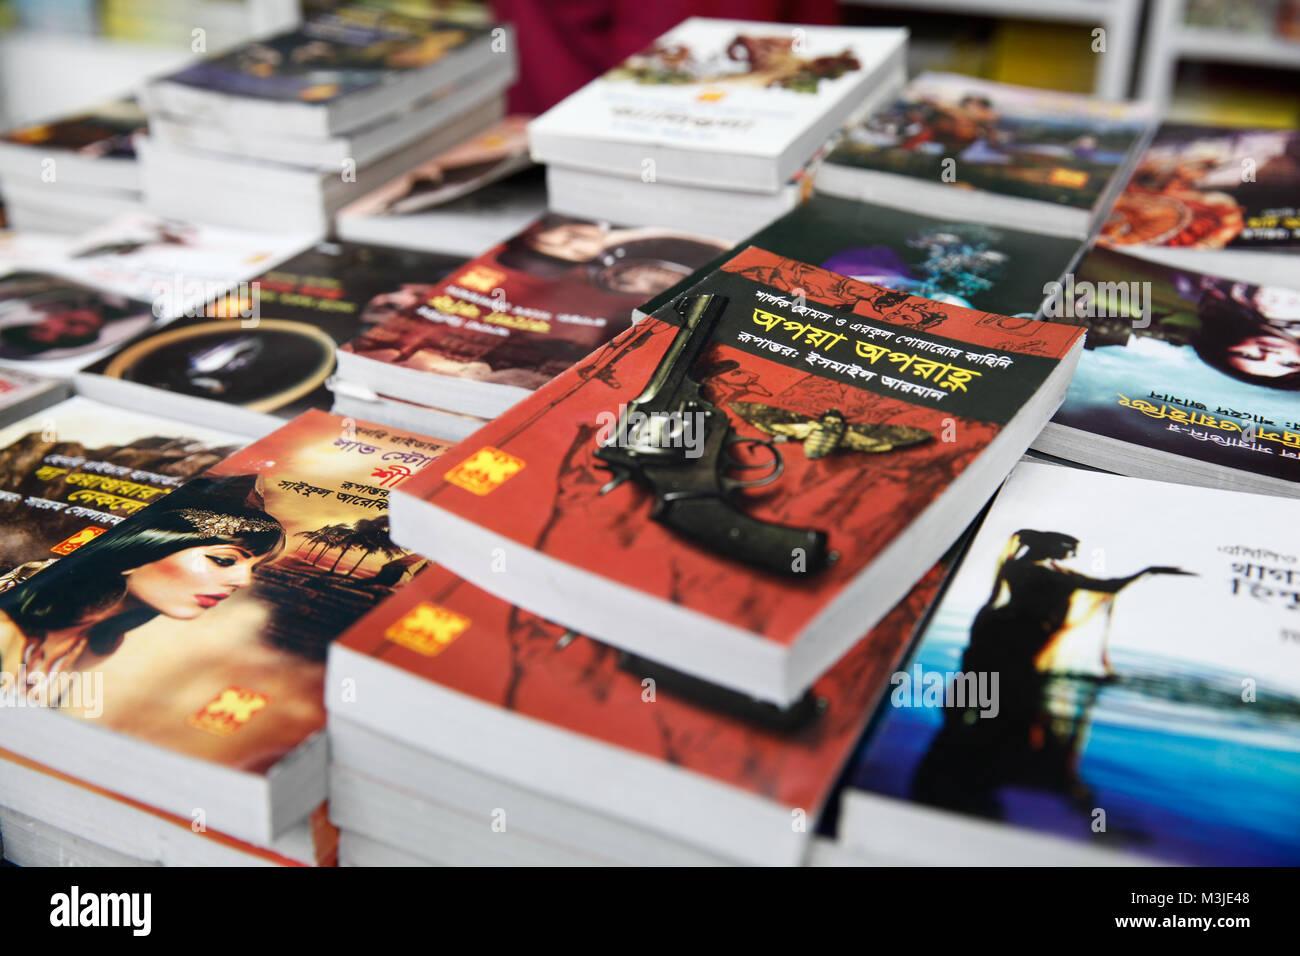 Charmant Buchmesse Flyer Vorlage Bilder - Entry Level Resume ...